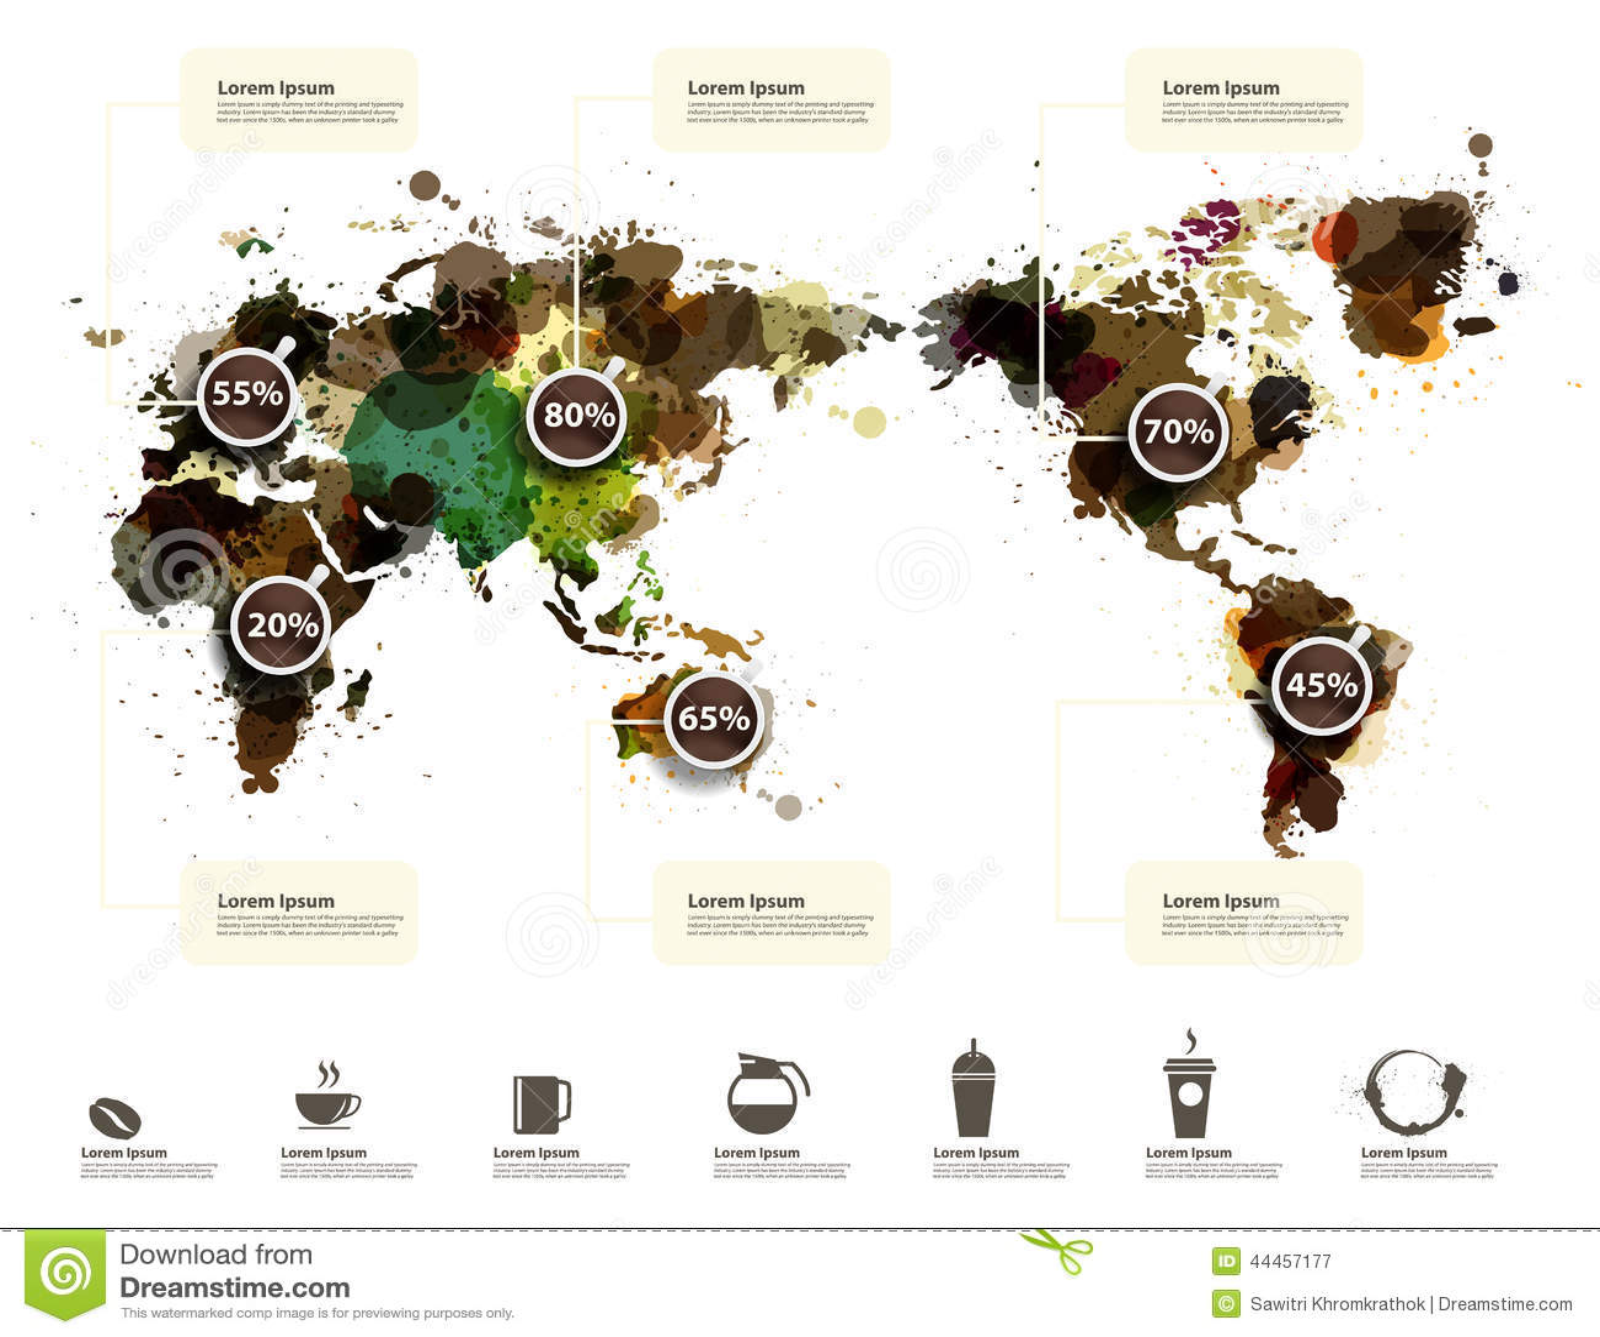 workflow diagram template moen single handle faucet vector world map of coffee ink splatter stock - illustration business, beans: 44457177